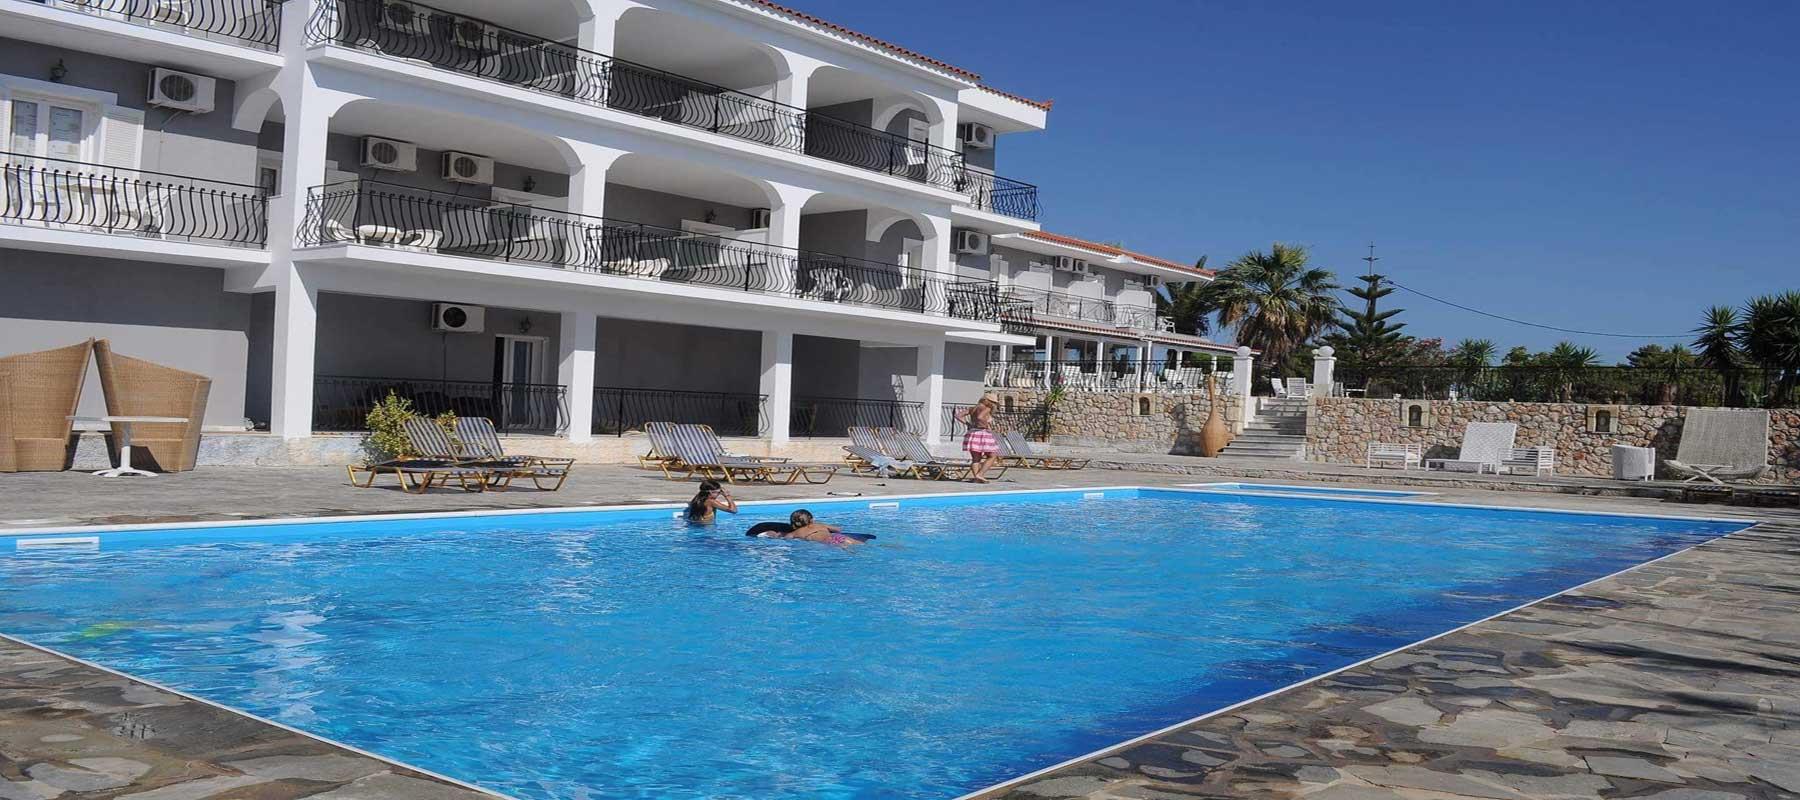 Sotiris Hotel